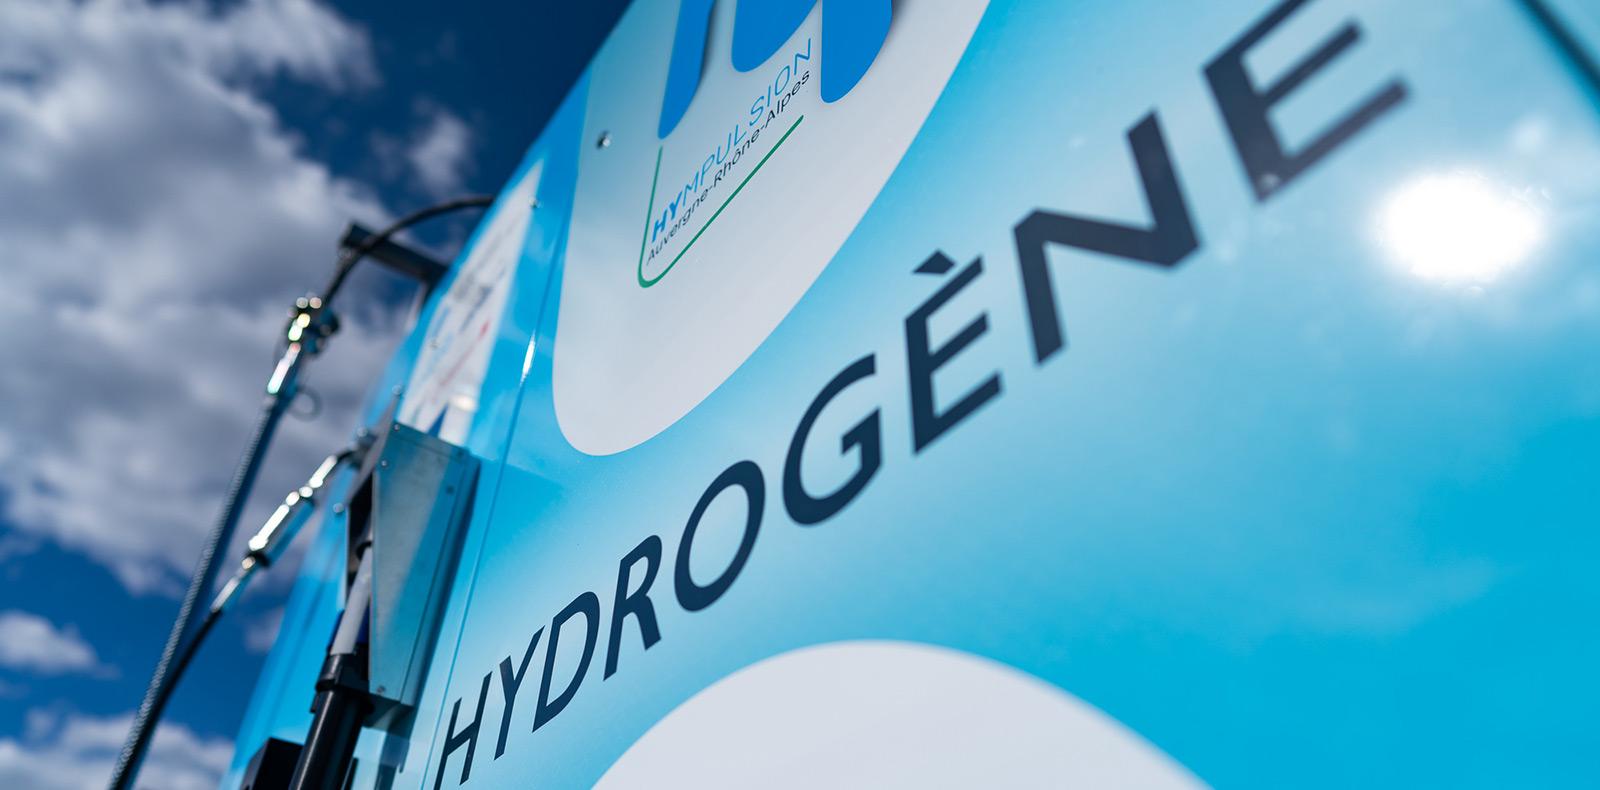 Hydrogen Station Michelin